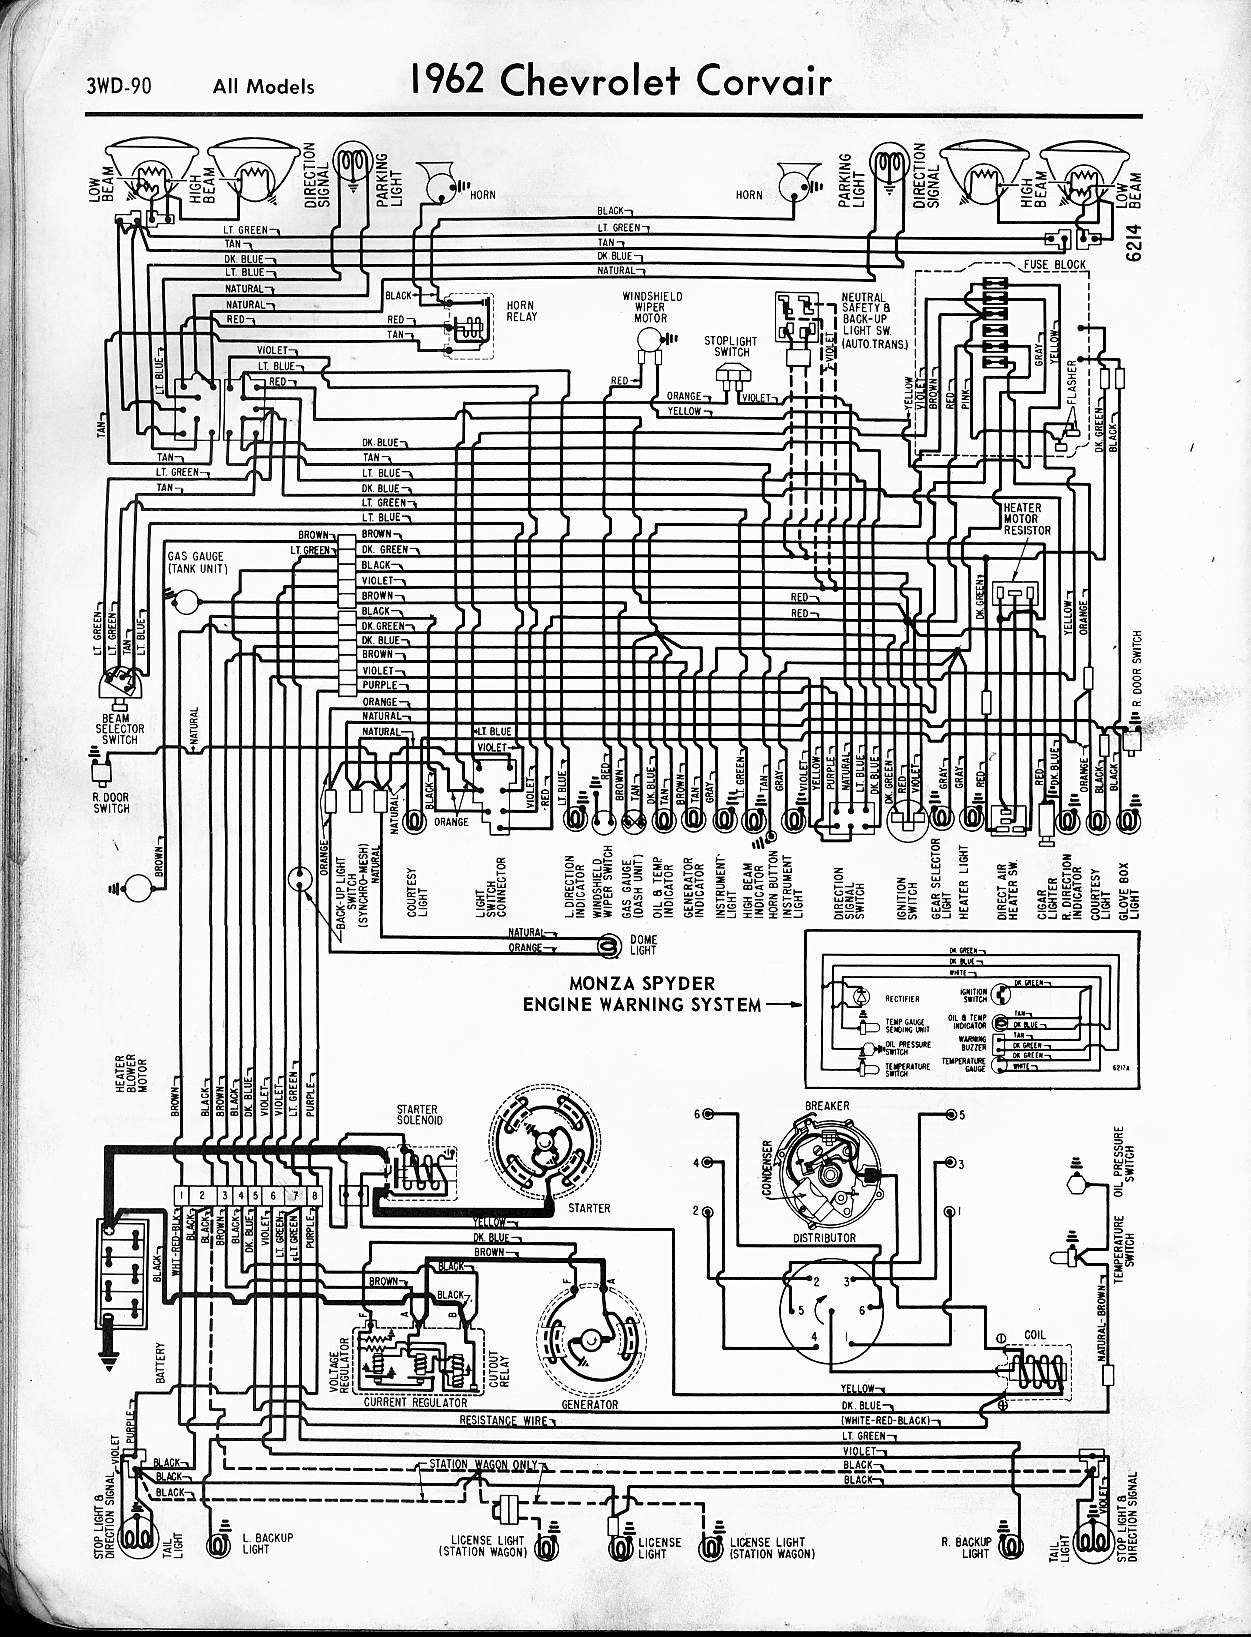 1957 chevrolet fuse box image 7